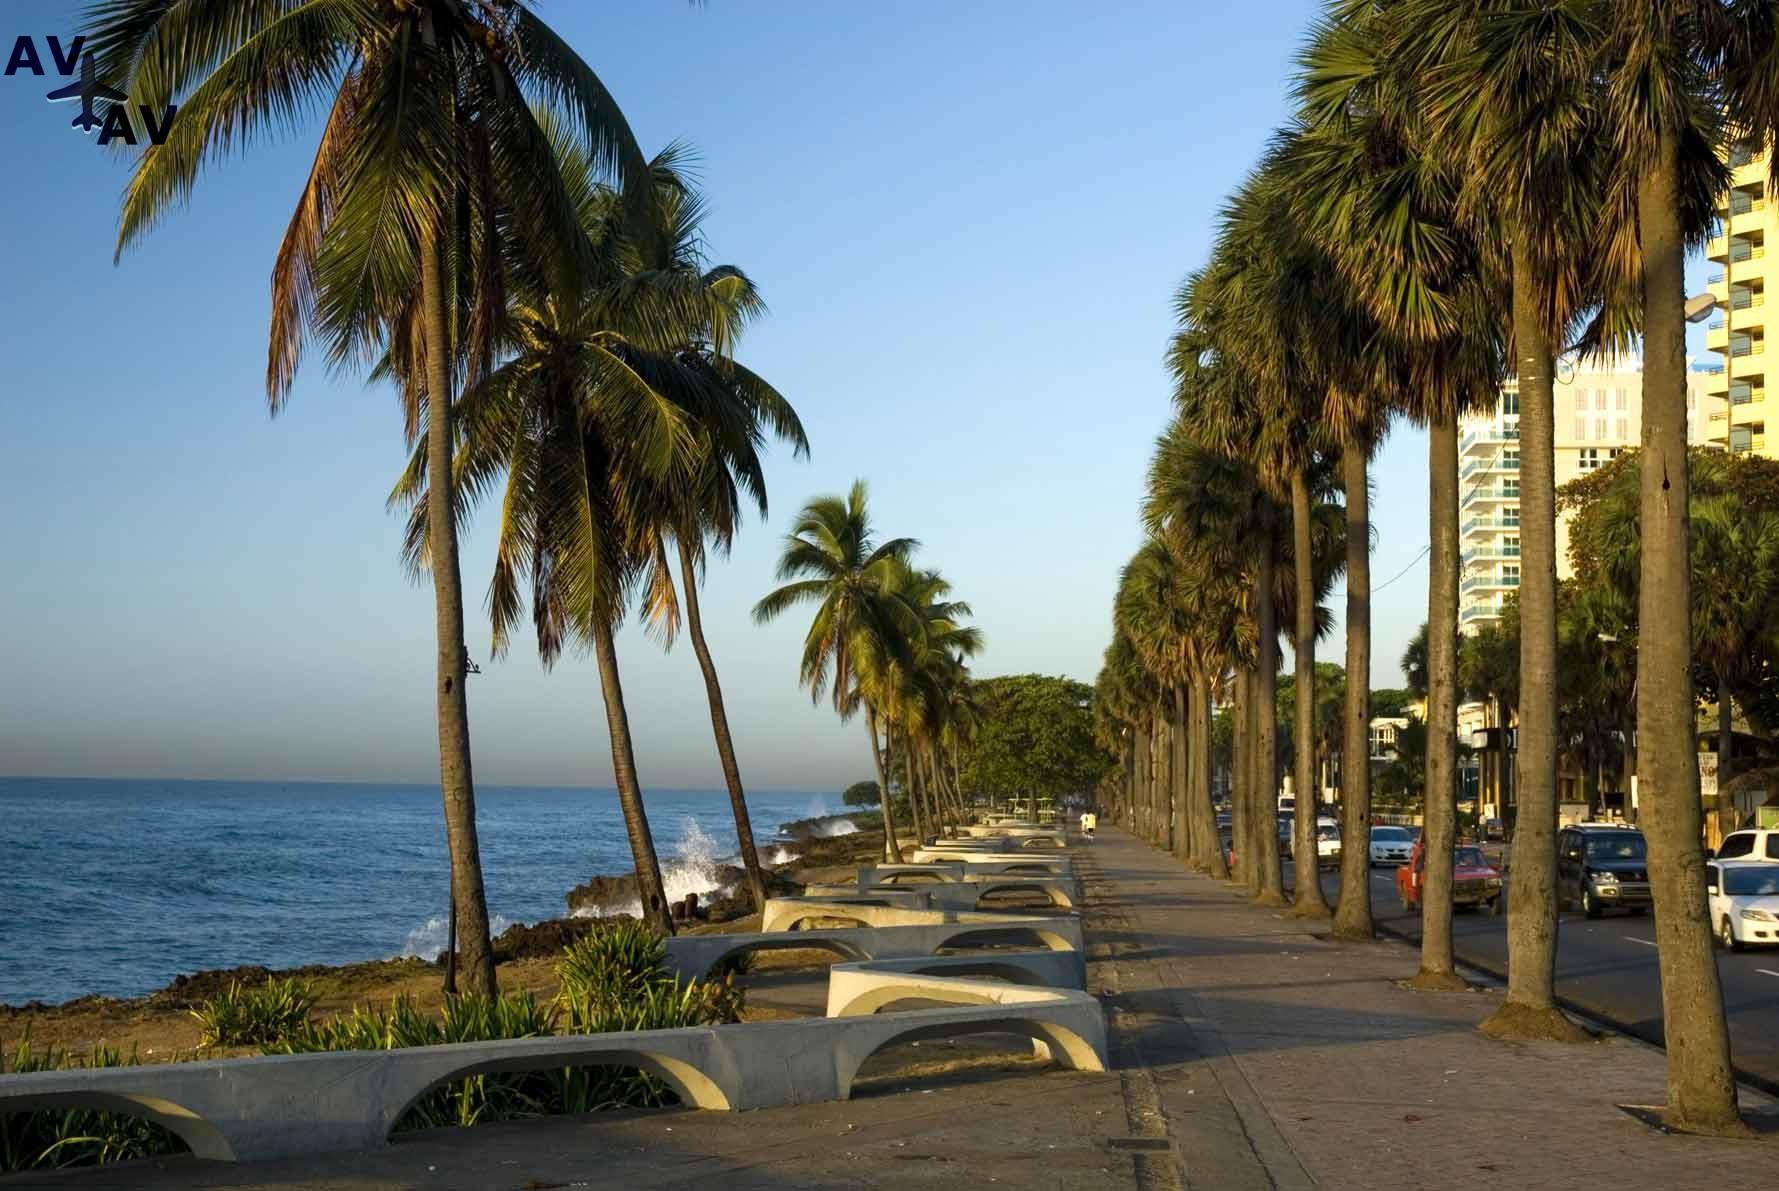 Karibskiy ray v Santo Domingo - Карибский рай в Санто-Доминго